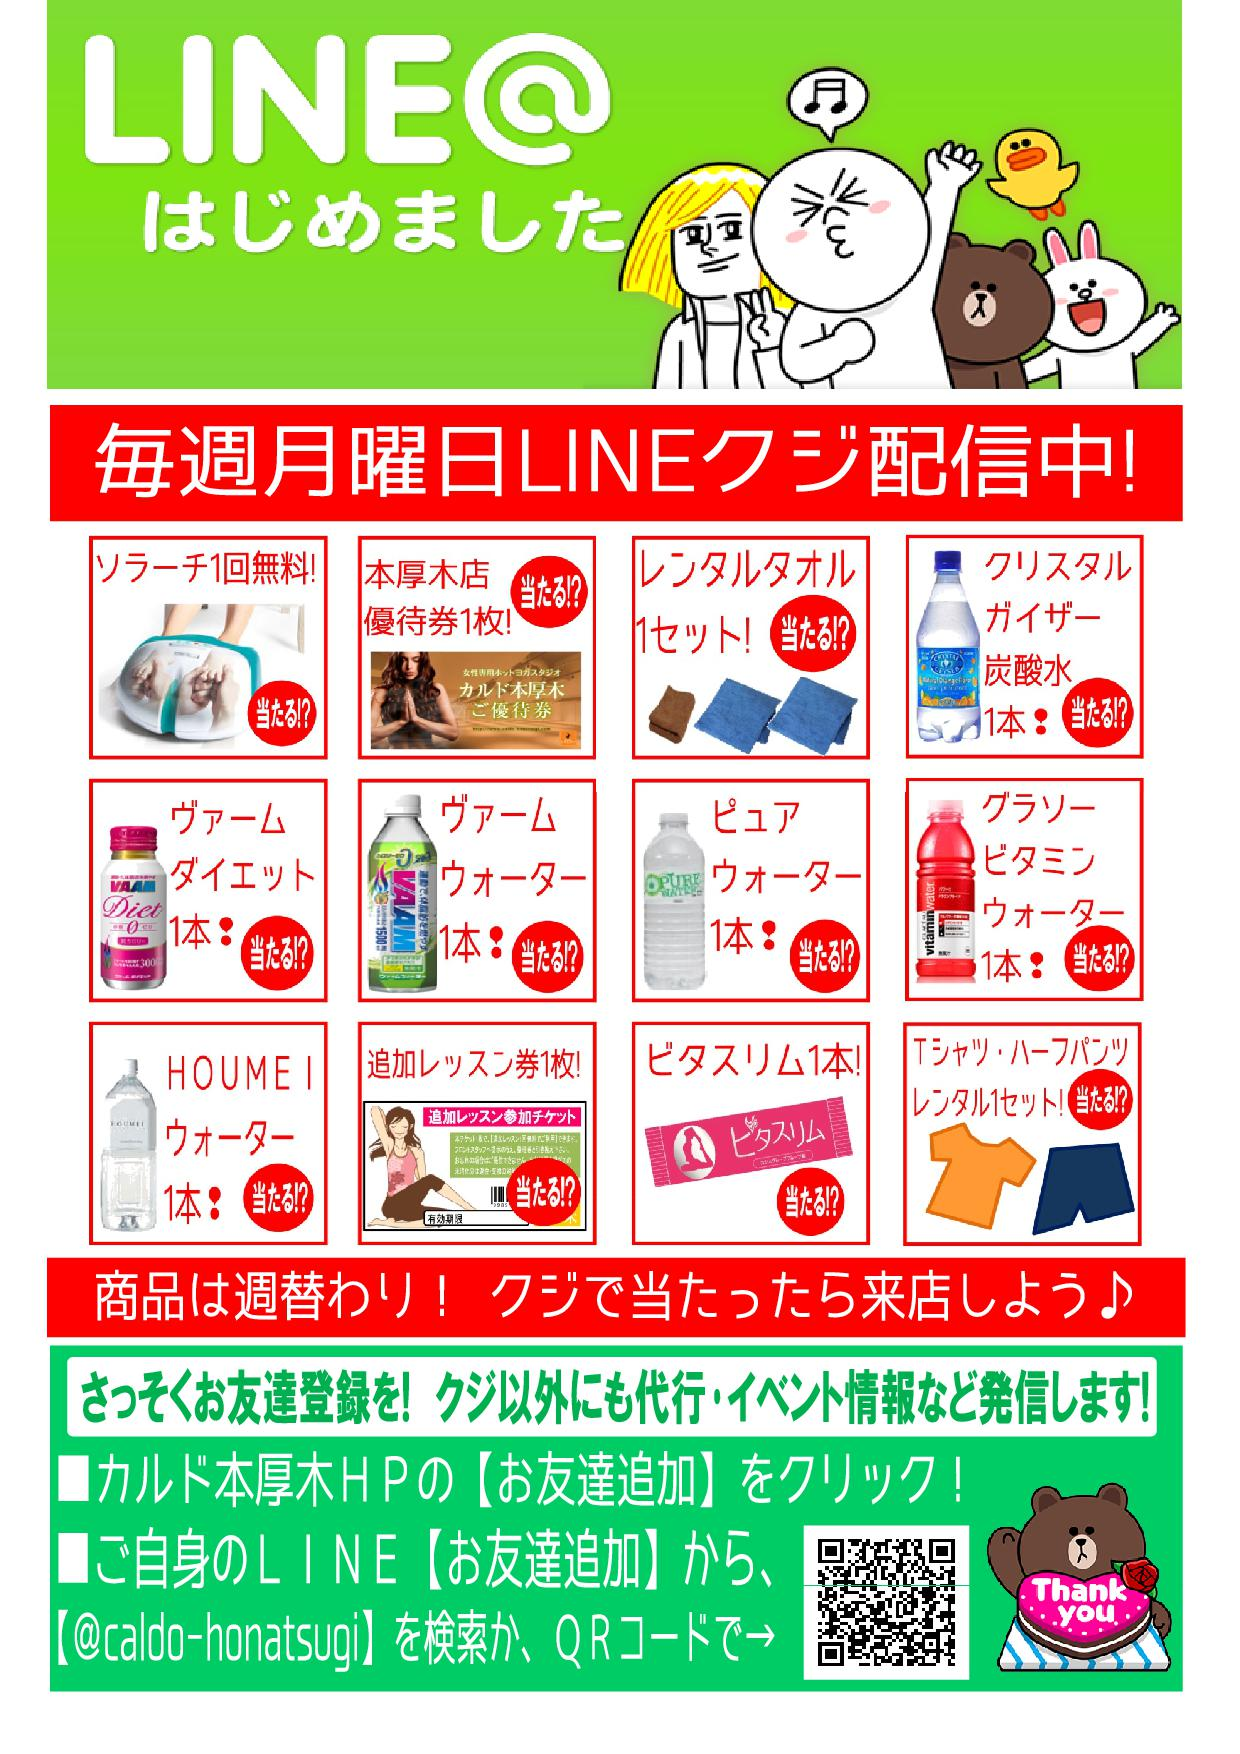 LINE@告知